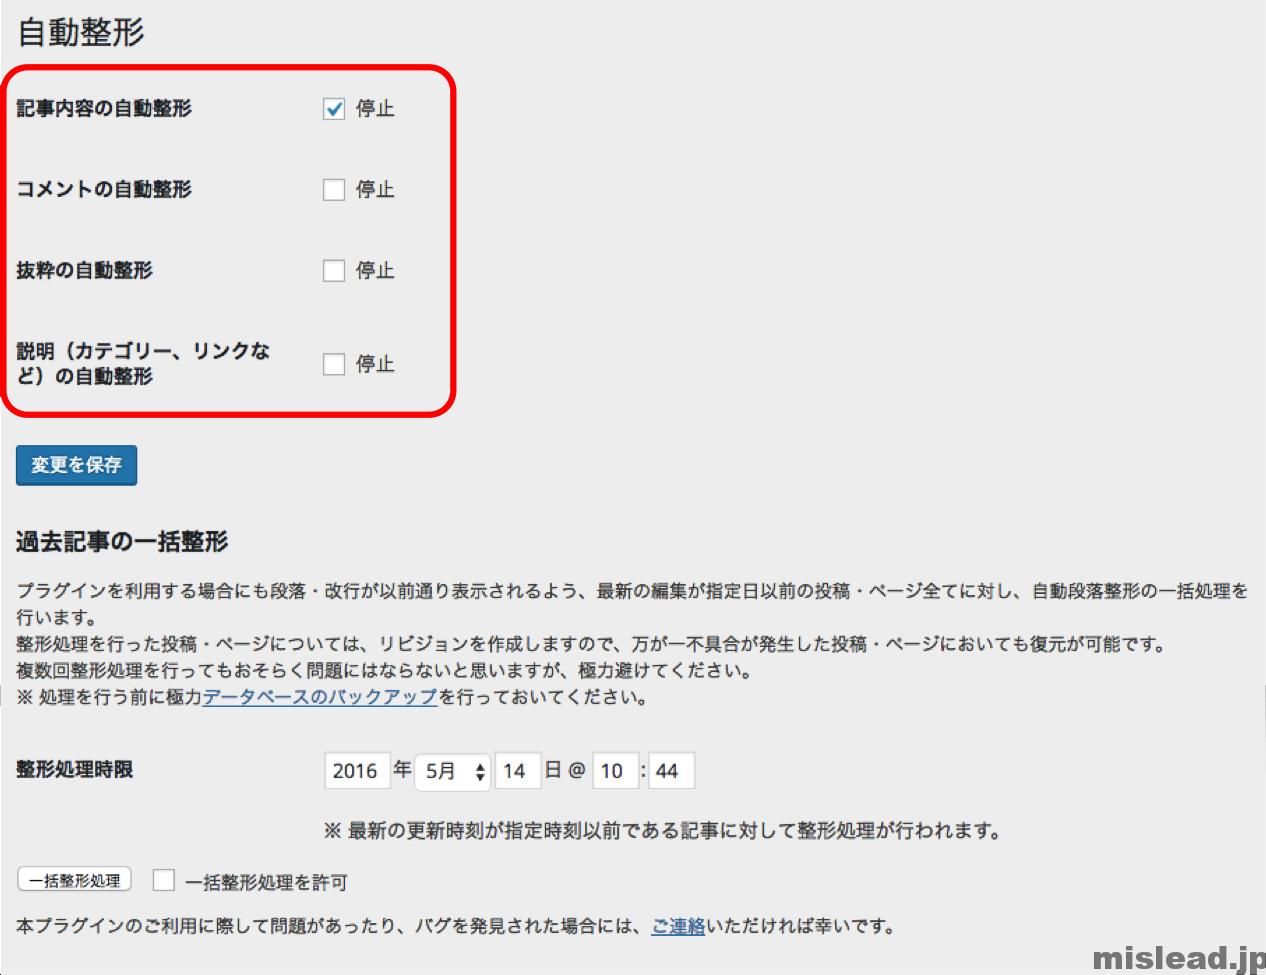 PS Disable Auto Formattingの設定画面